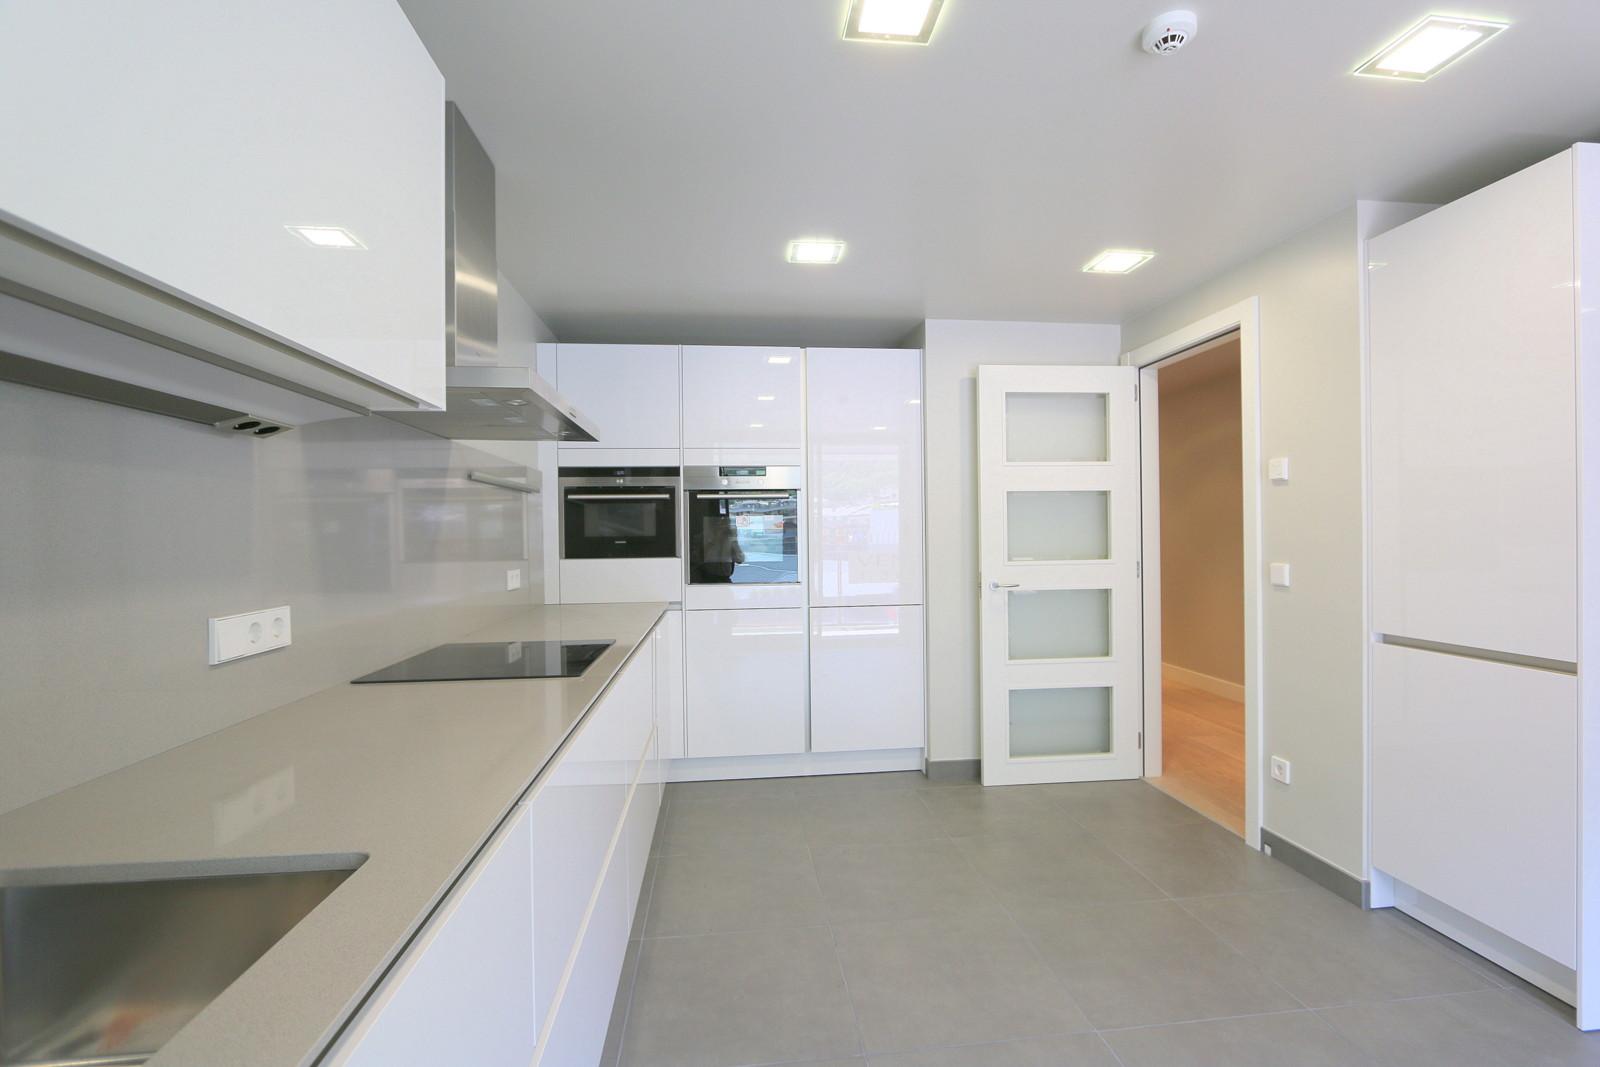 1.065.000 € Exclusief drie slaapkamer appartement te koop in Andorra ...